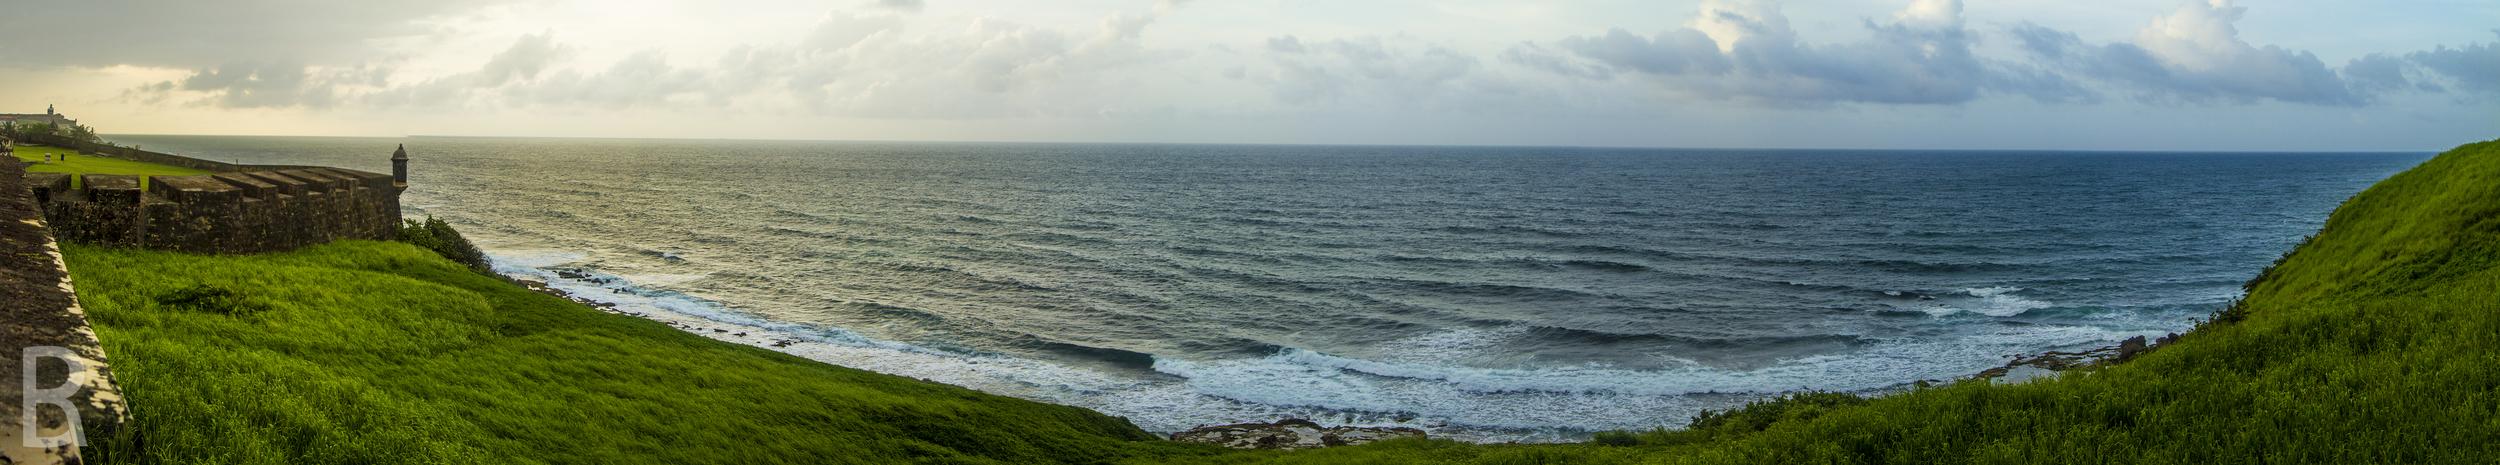 SITE-Puerto Rico-1.jpg